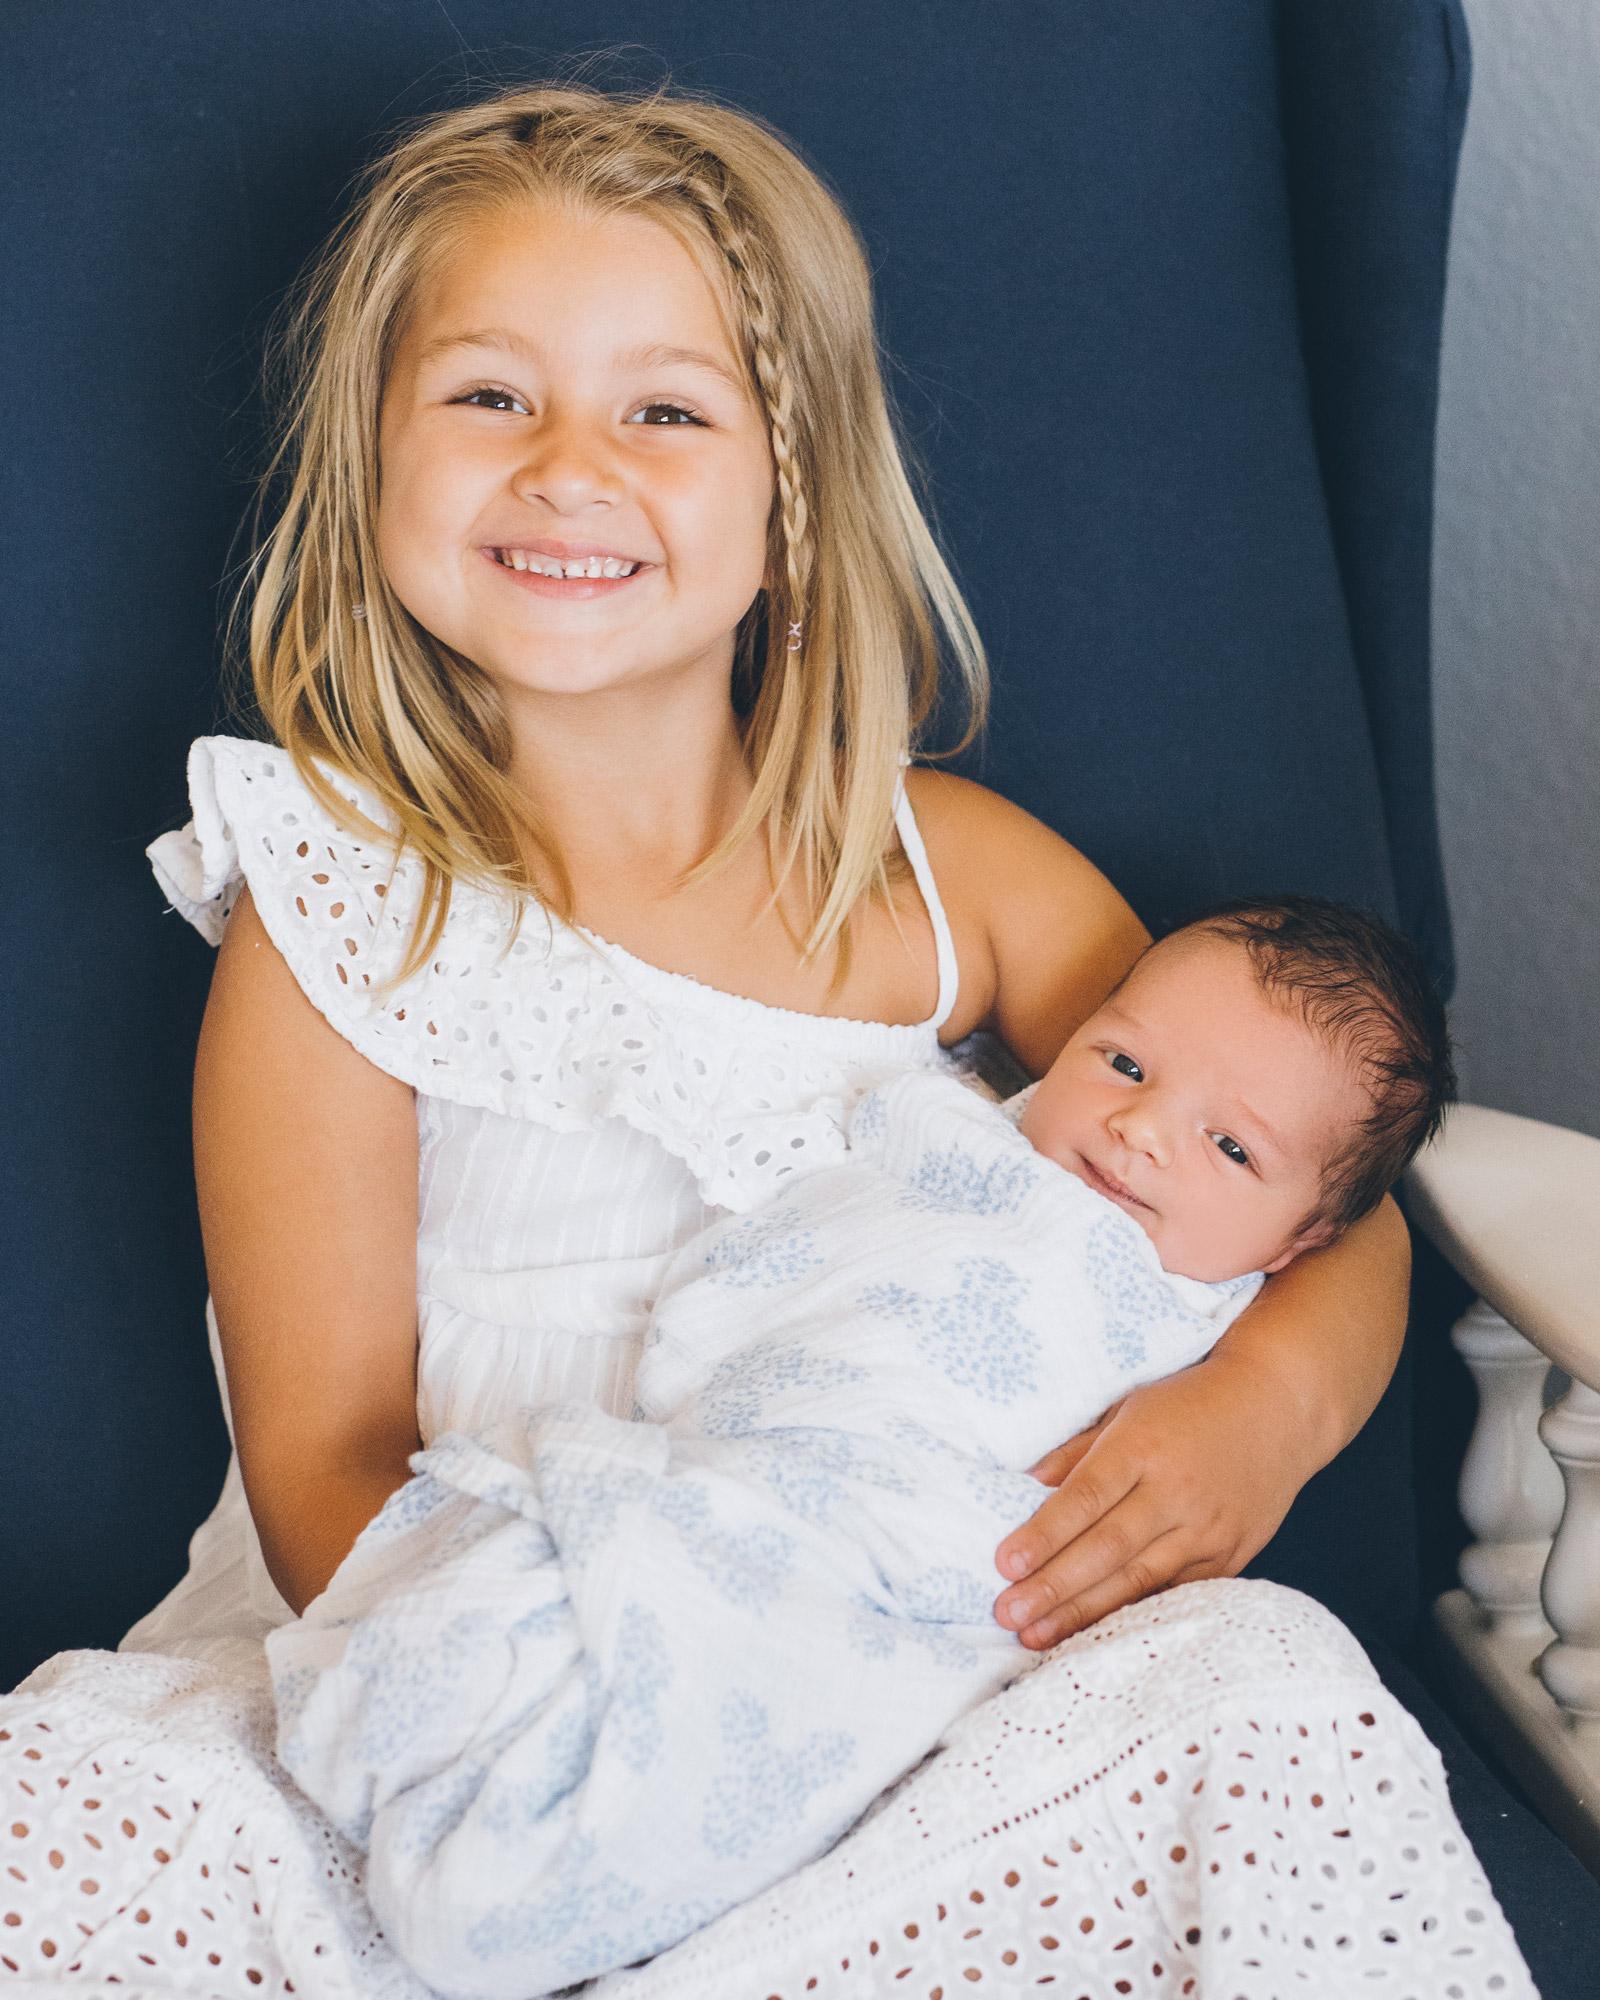 big-sister-holding-newborn-baby-brother.jpg